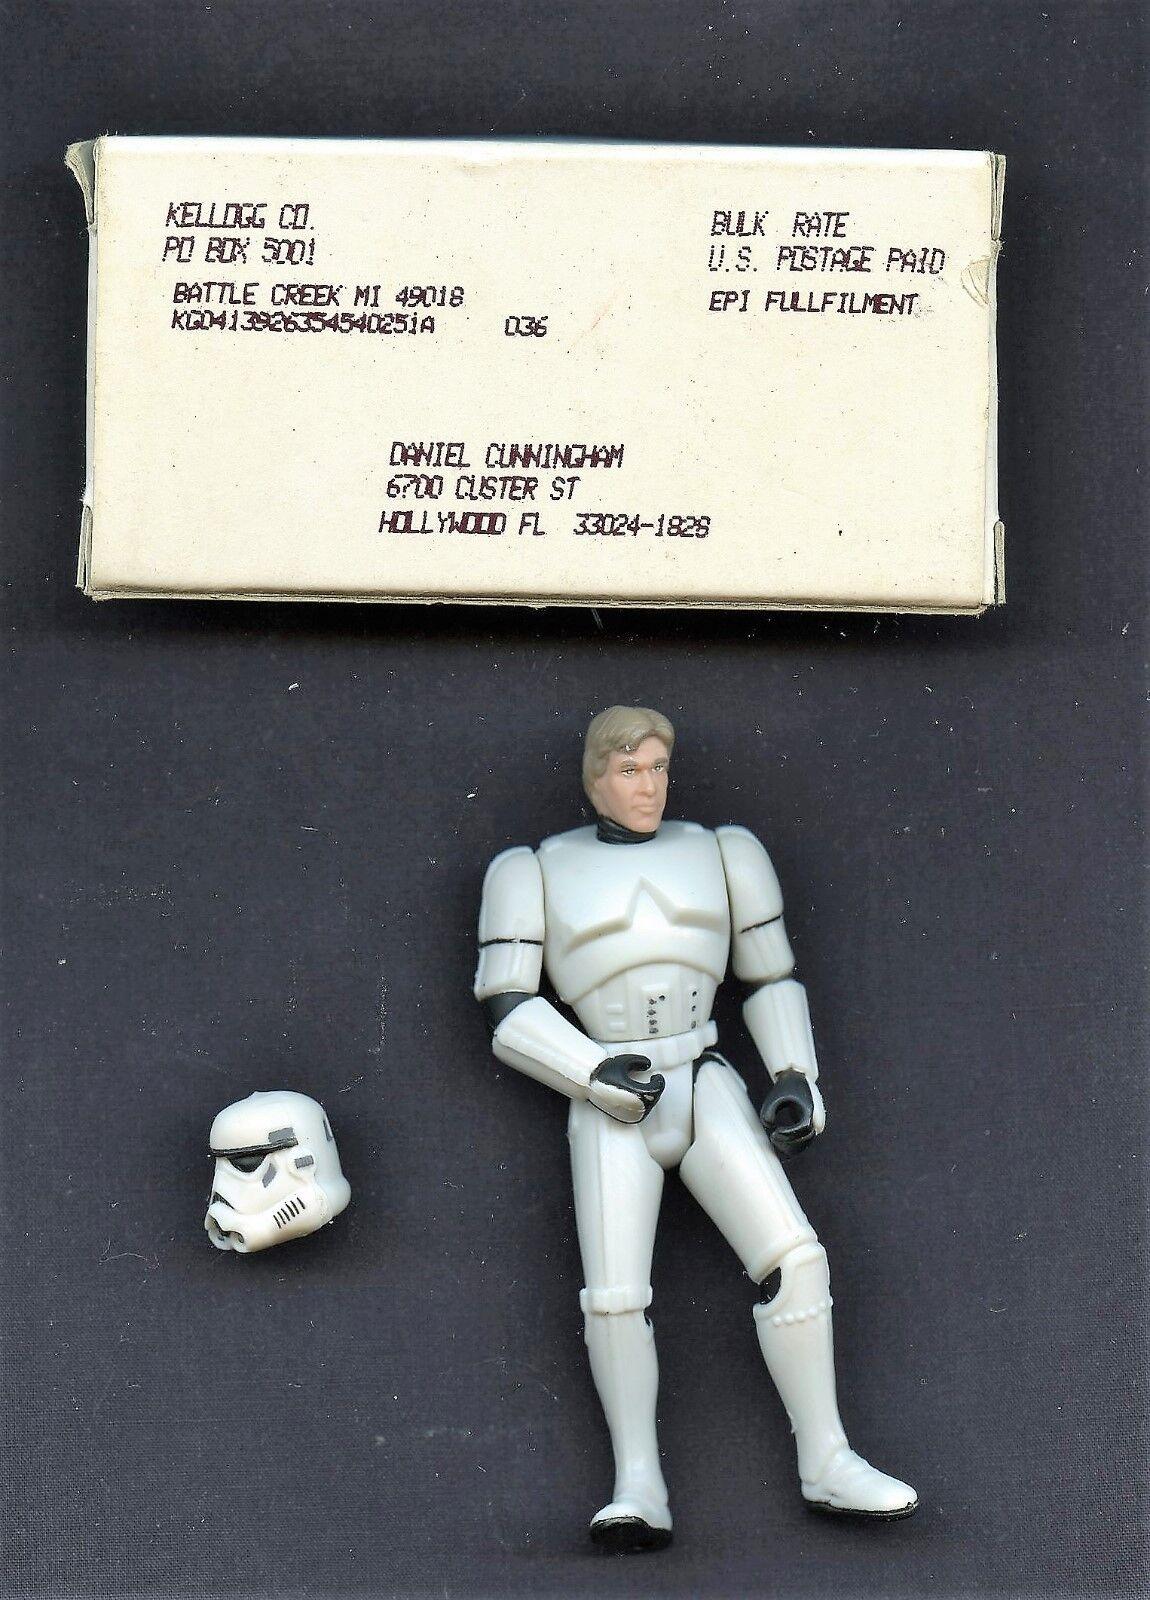 Luke skywalker als stormtrooper star - wars - jahrgang kellogg 3.5.action - figur